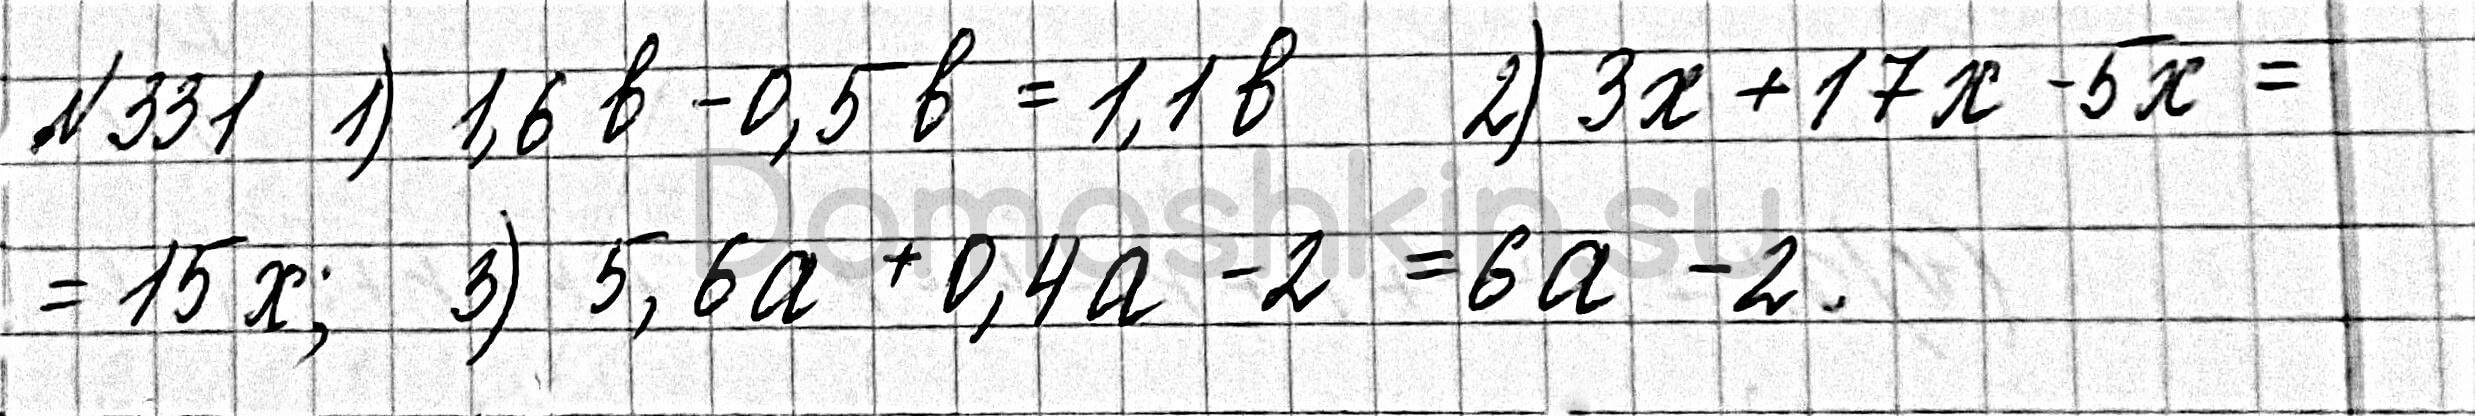 Математика 6 класс учебник Мерзляк номер 331 решение